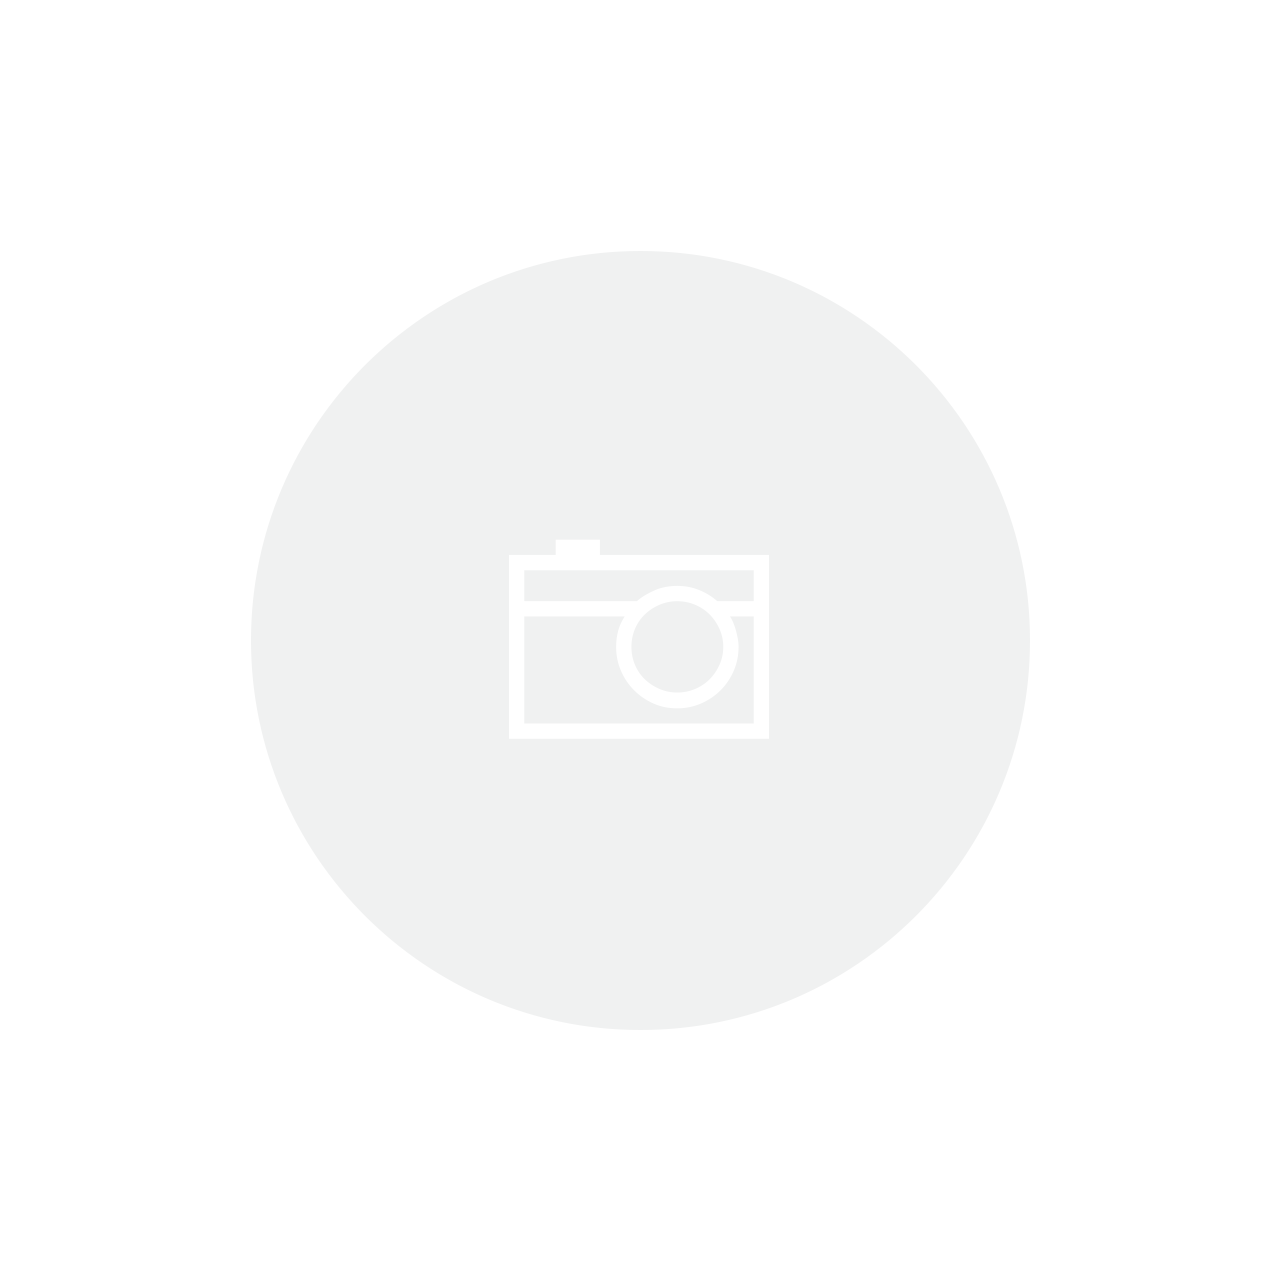 Caçarola Funda Inox ø24cm 6,10 Litros Professional